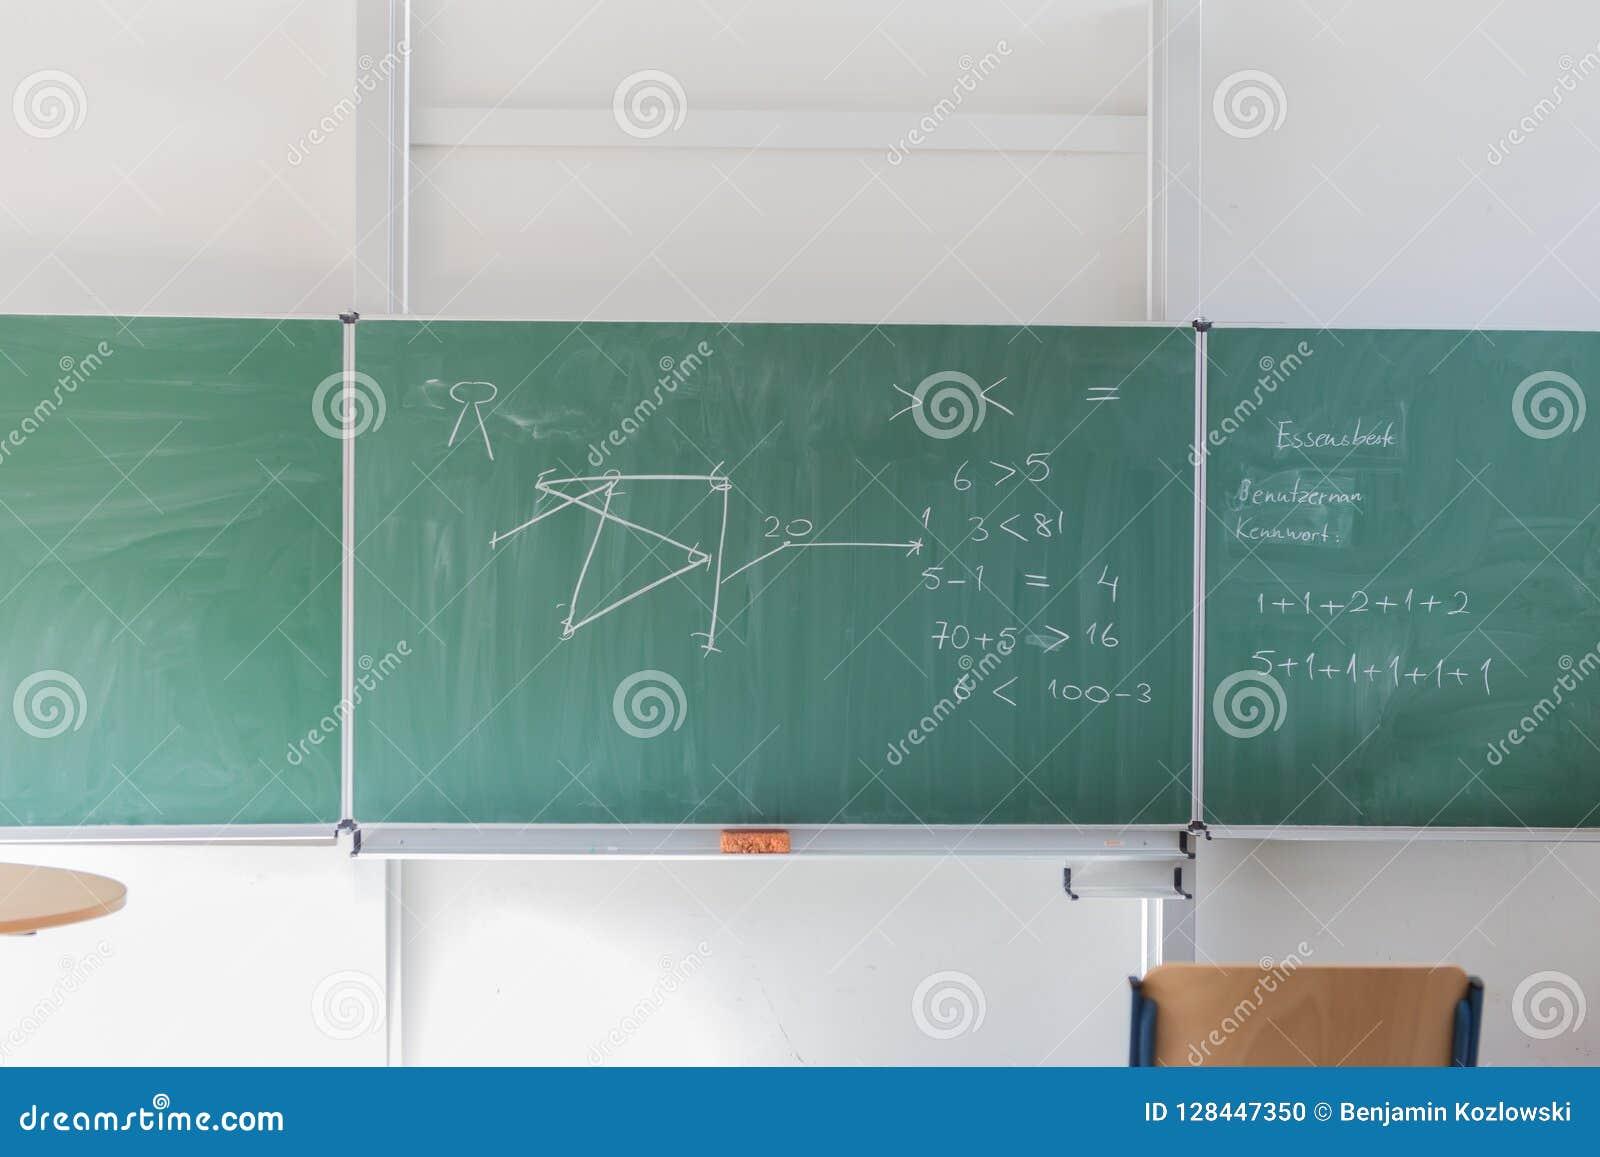 Chalkboard with mathematical formula